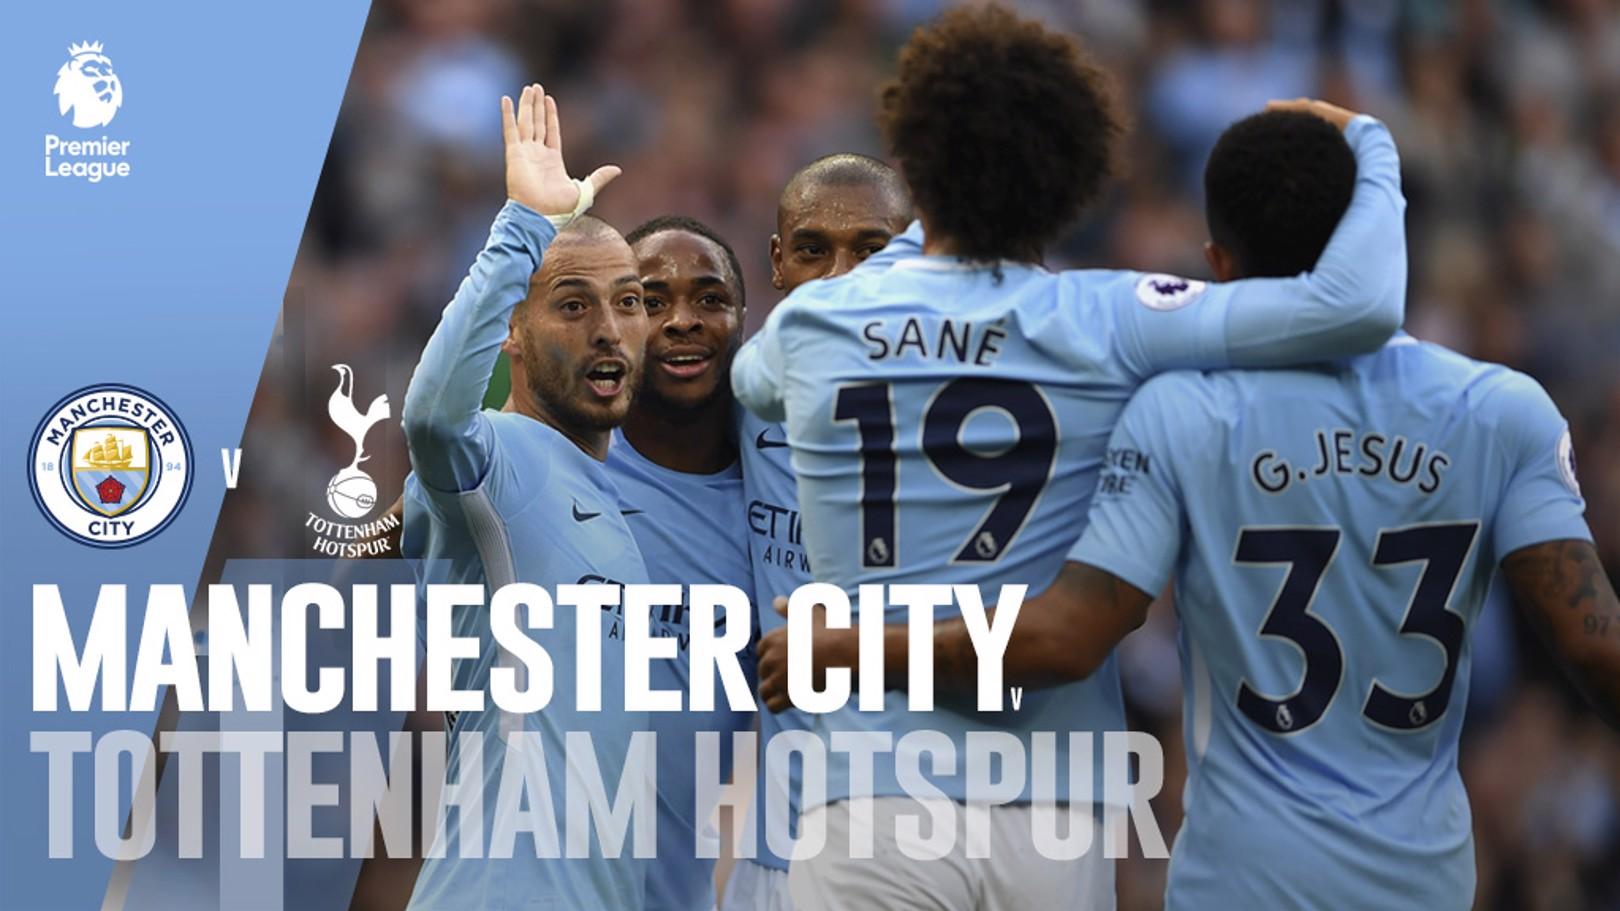 Manchester City - Tottenham Hotspur.